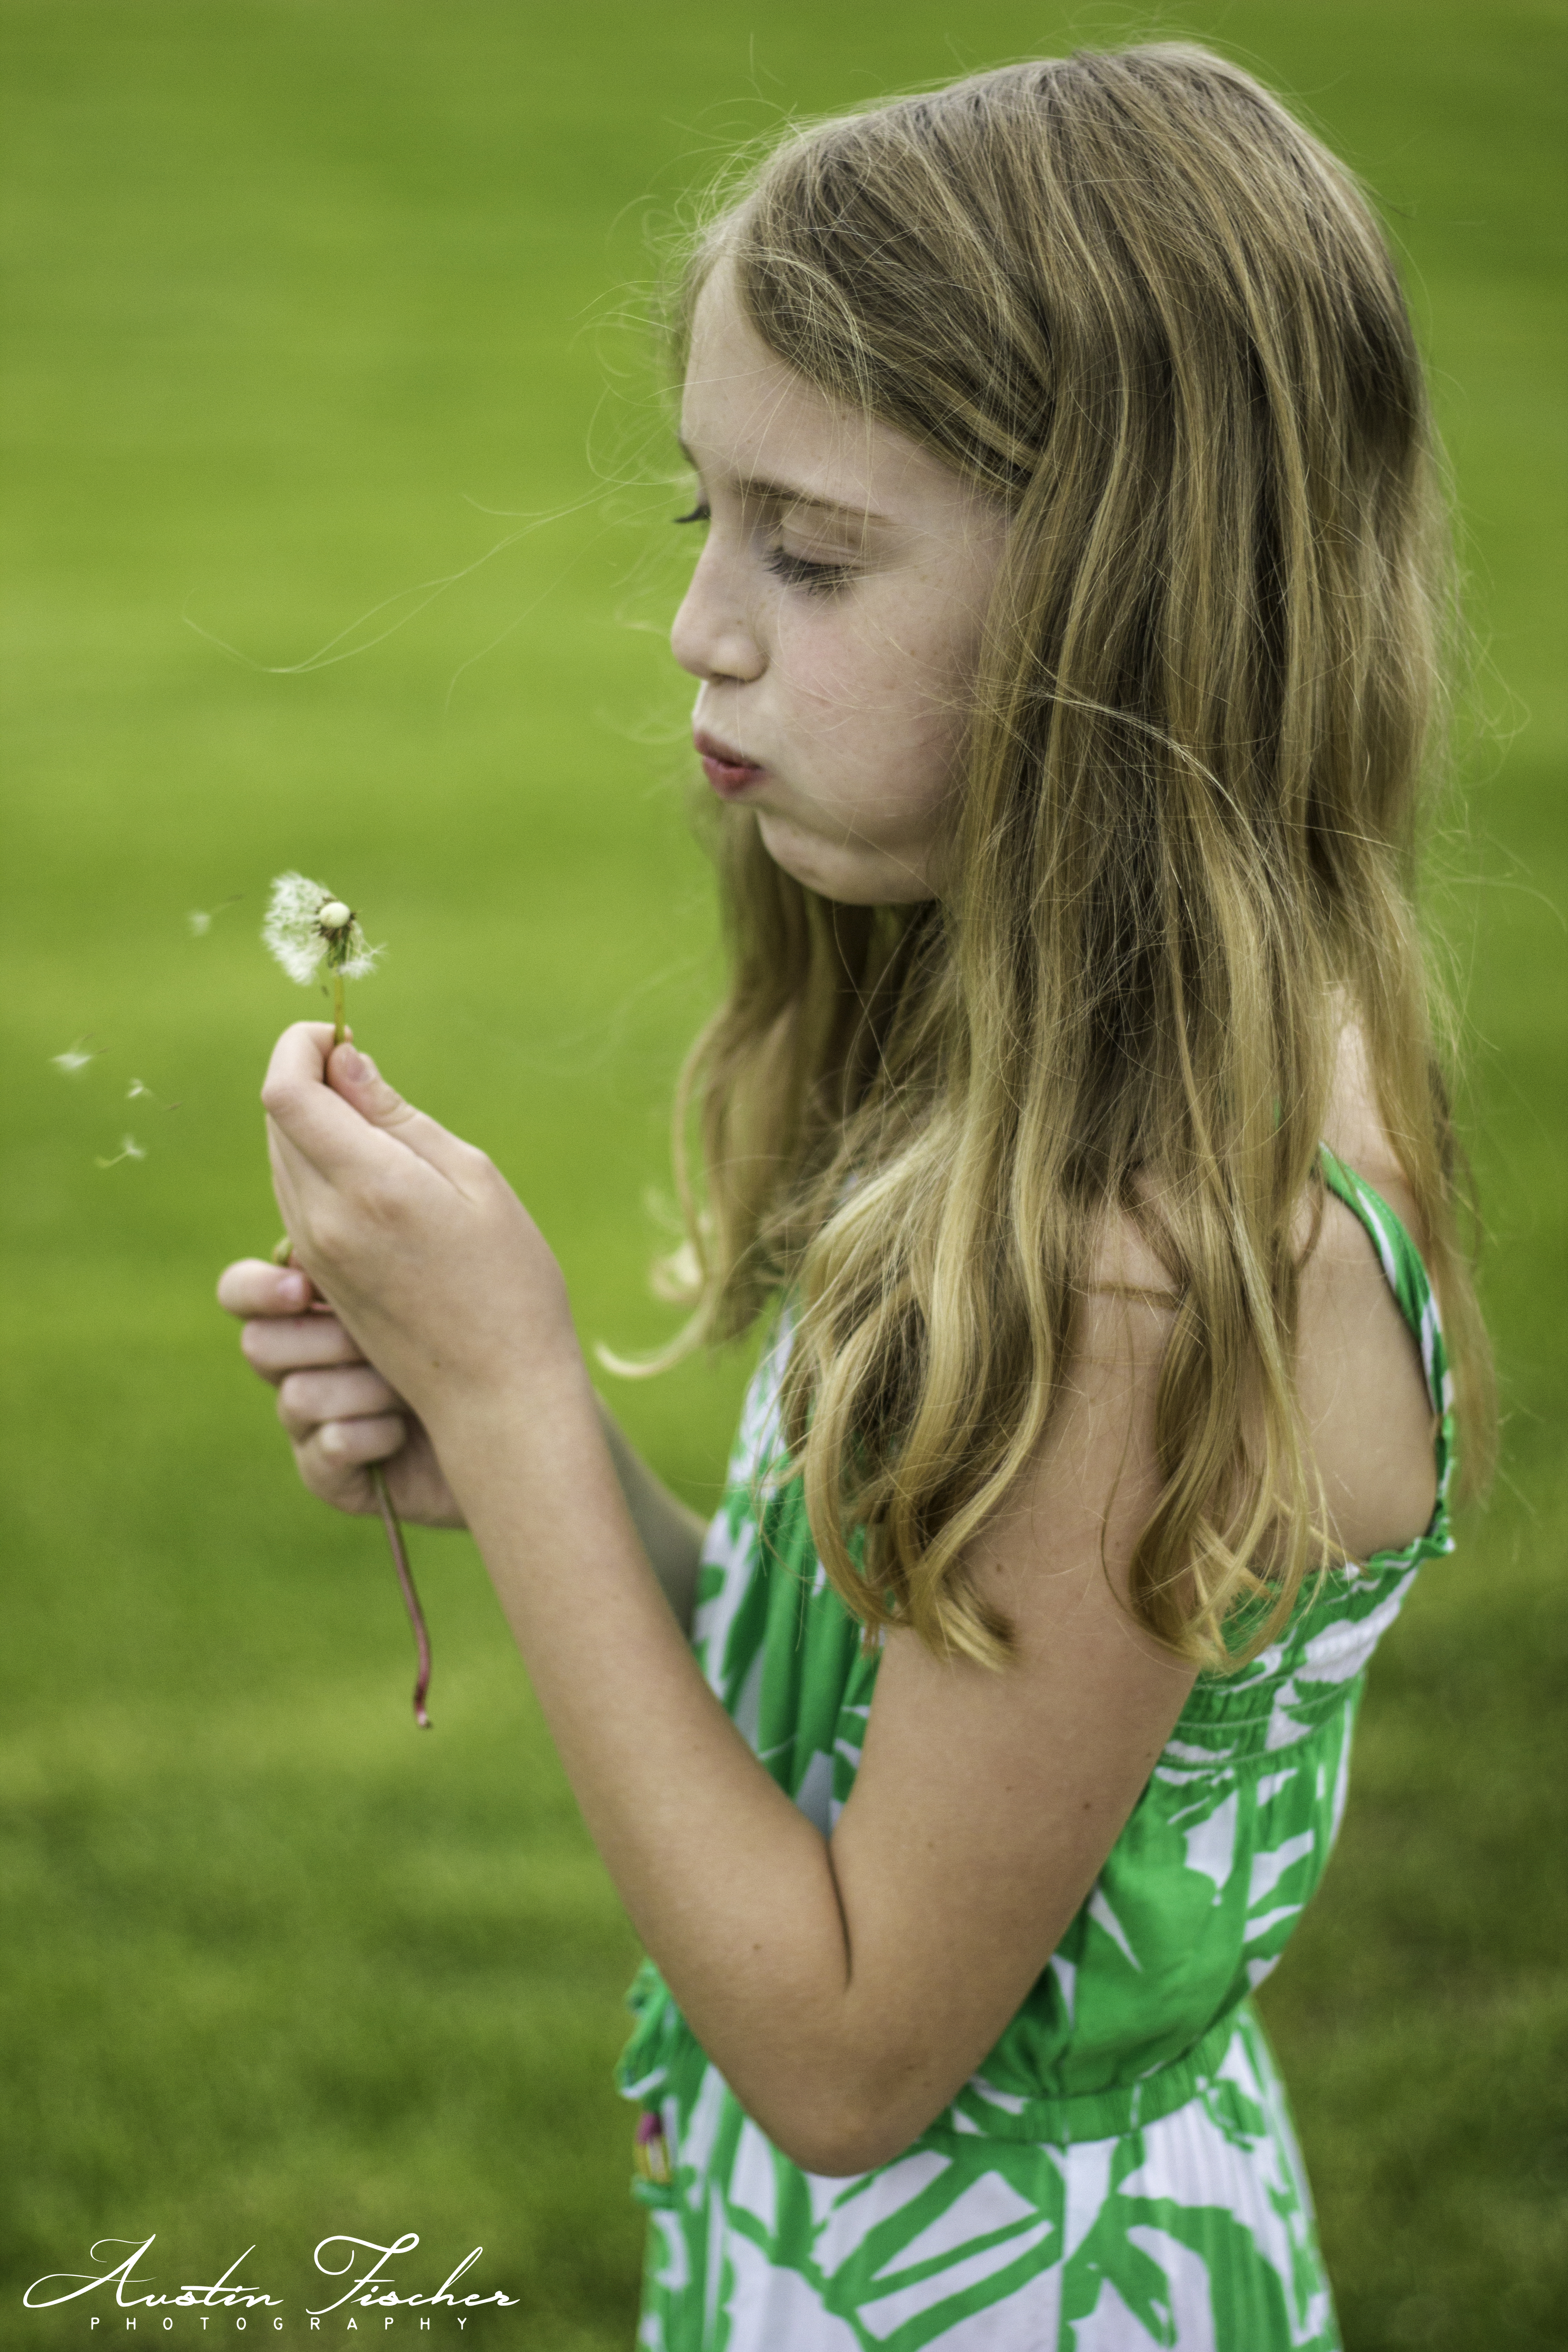 Talia Dandelion Portrait